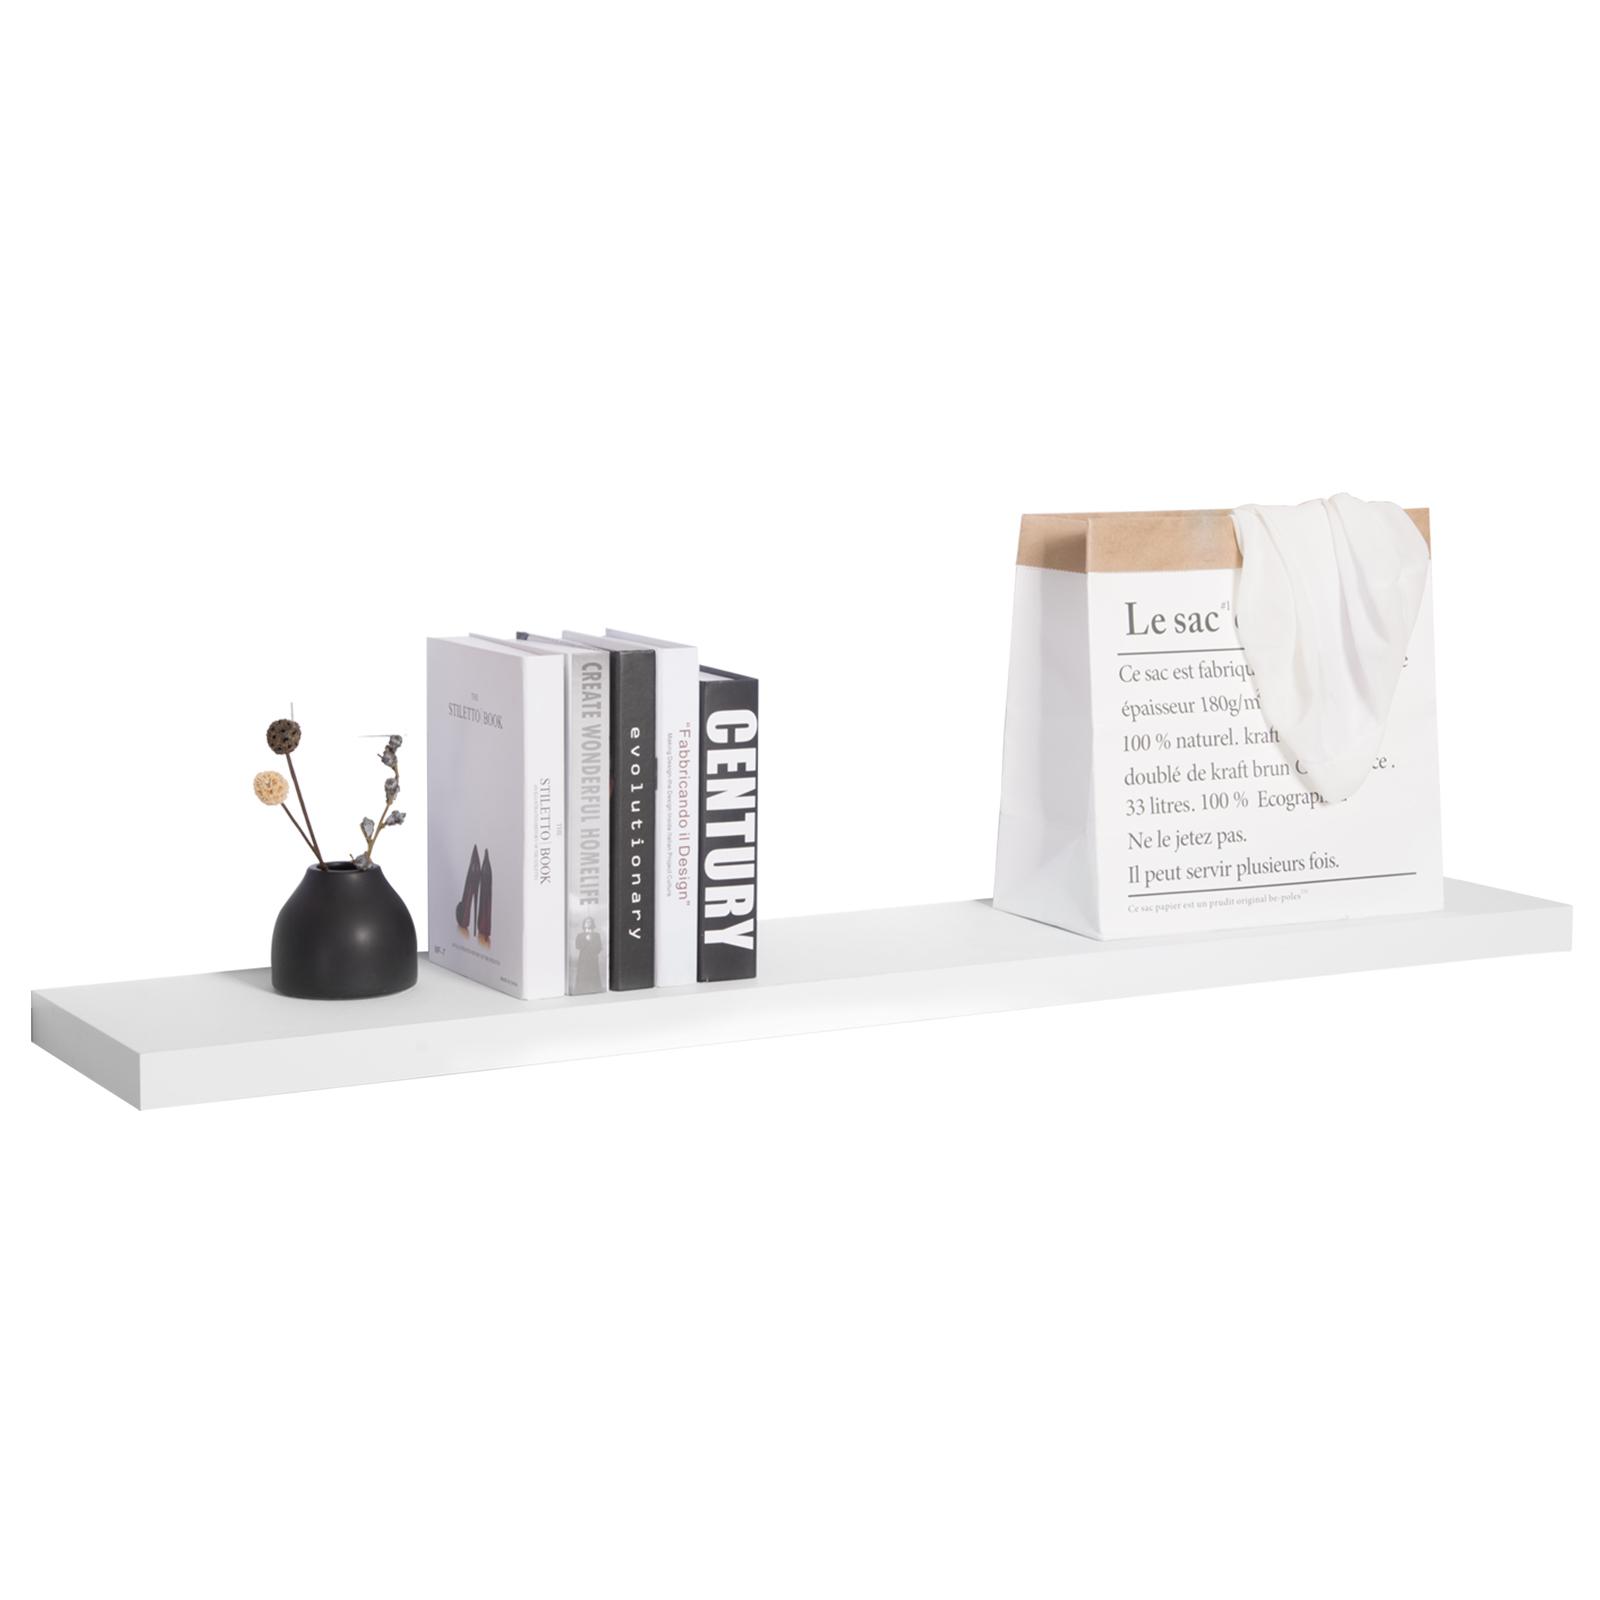 wandboard wandregal b cherregal cd dvd regal holz board 60cm lang wei sws0196 ebay. Black Bedroom Furniture Sets. Home Design Ideas